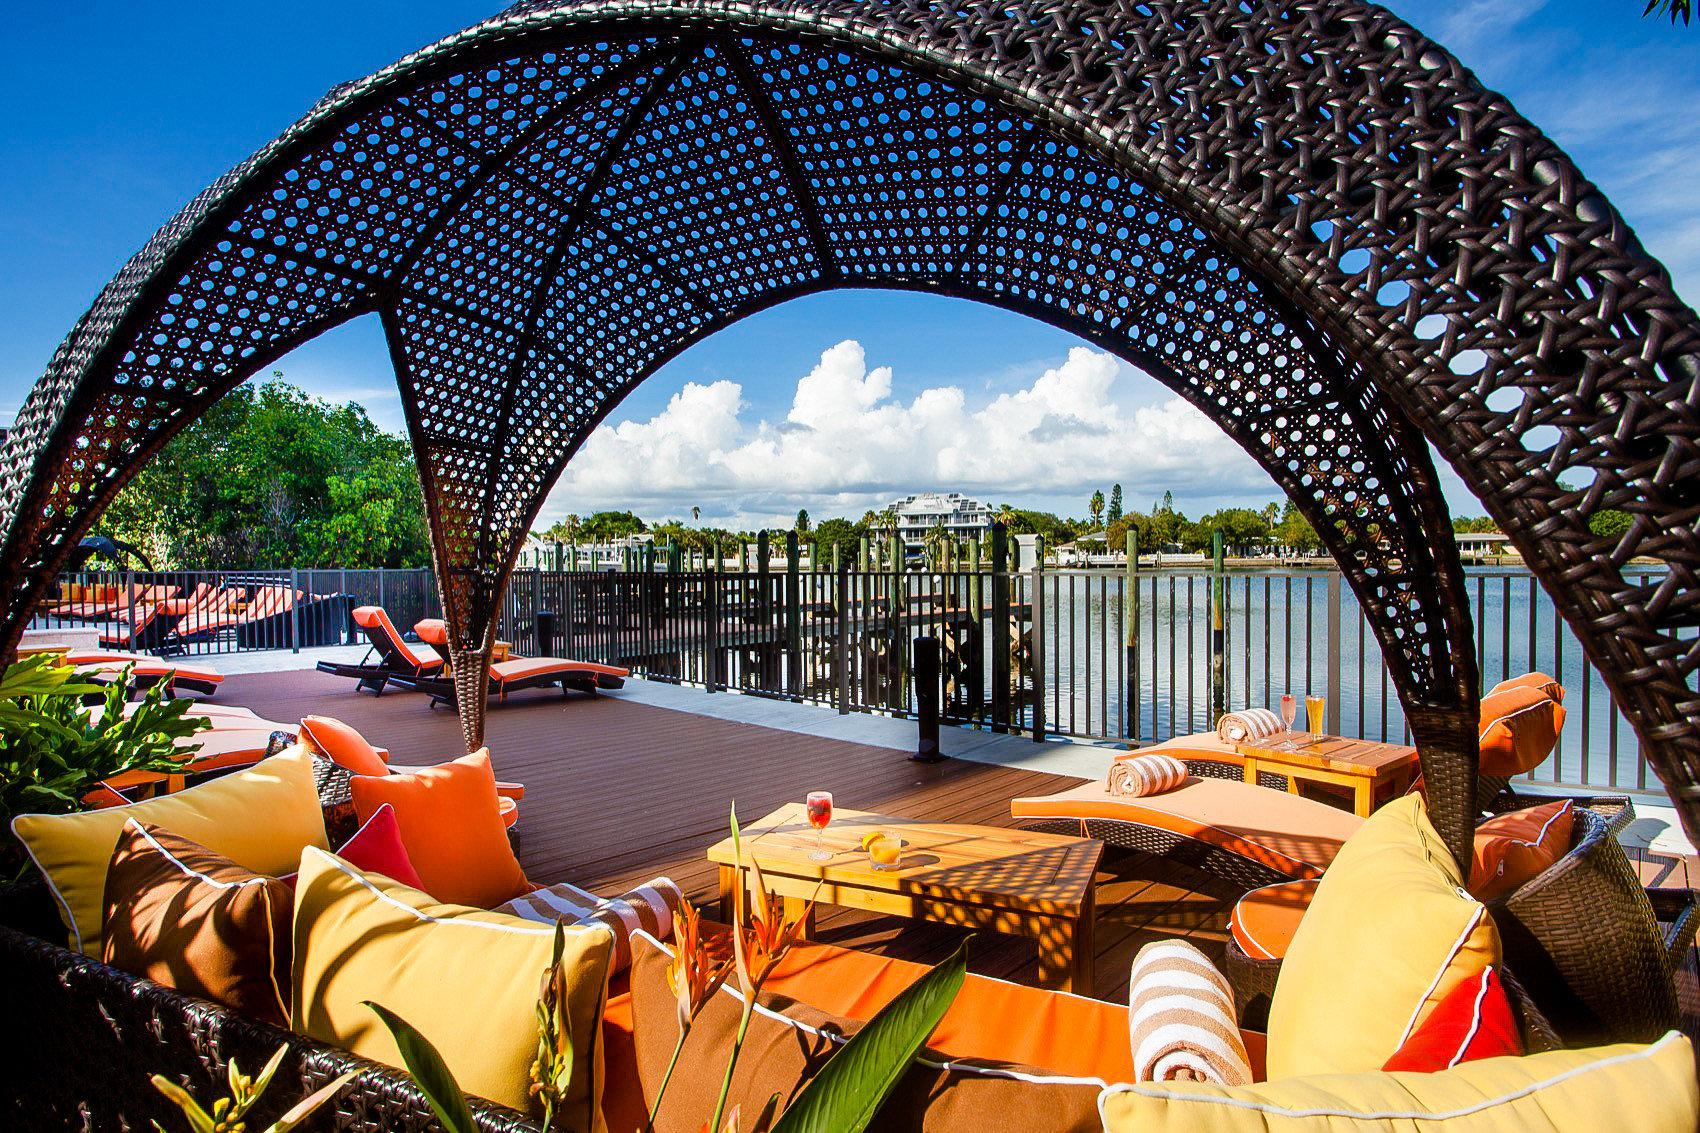 Trip Ideas leisure building tourism vacation Resort travel arch